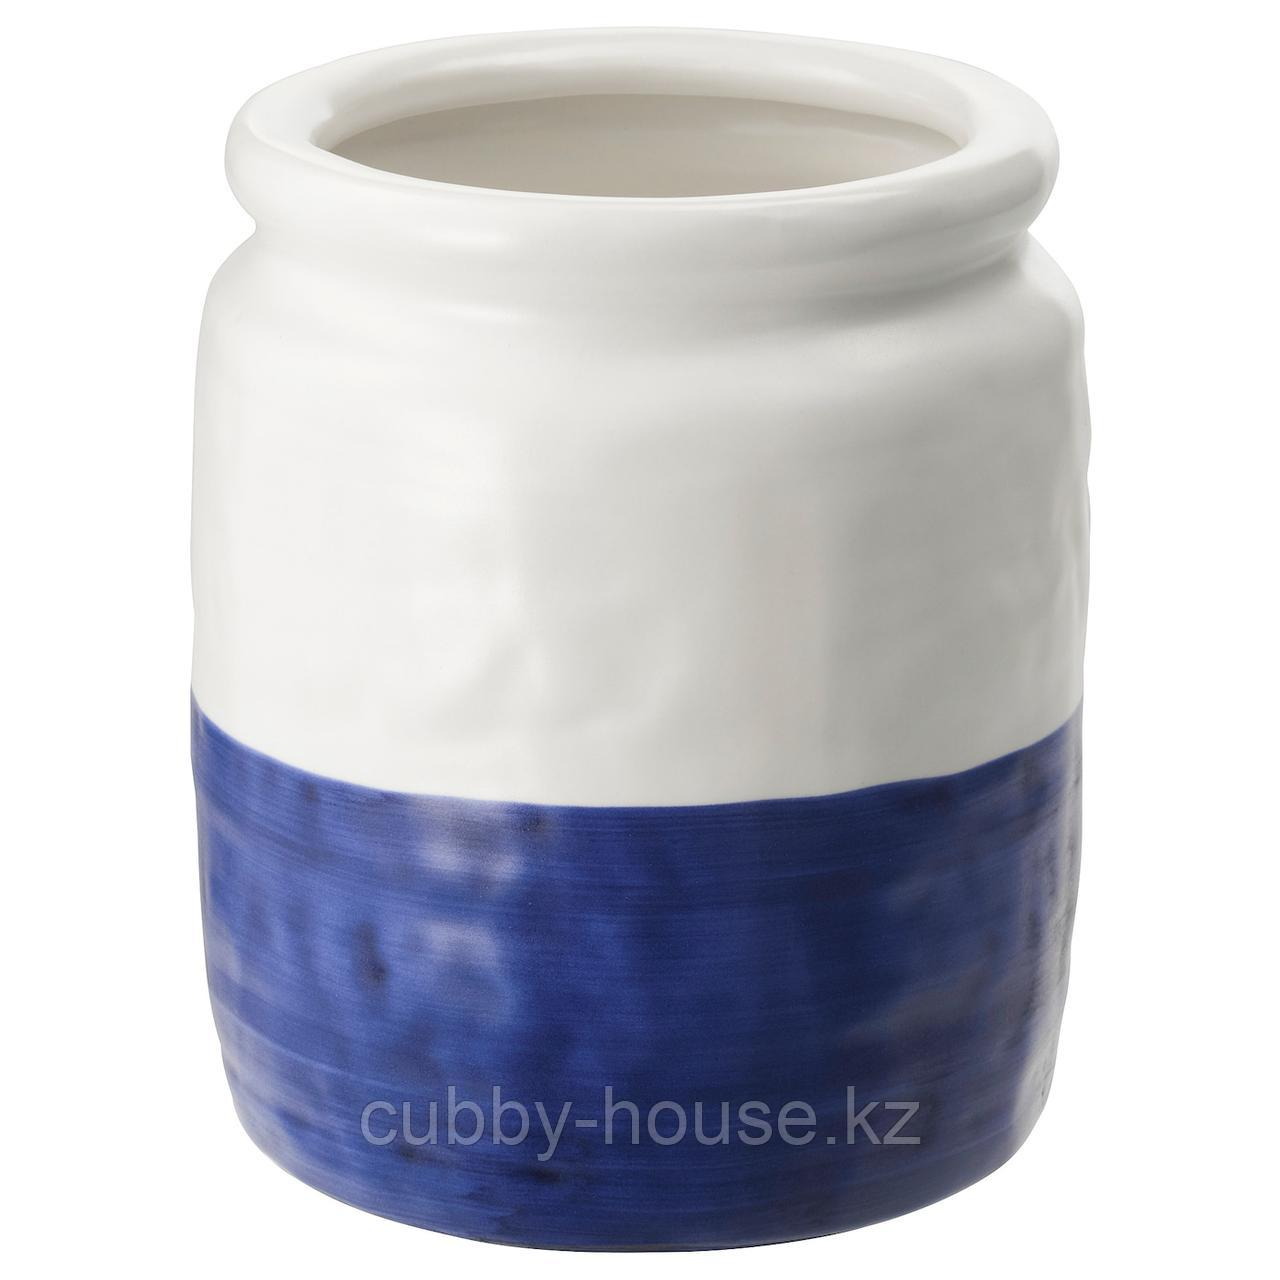 ГОДТАГБАР Ваза, керамика белый/синий, 18 см